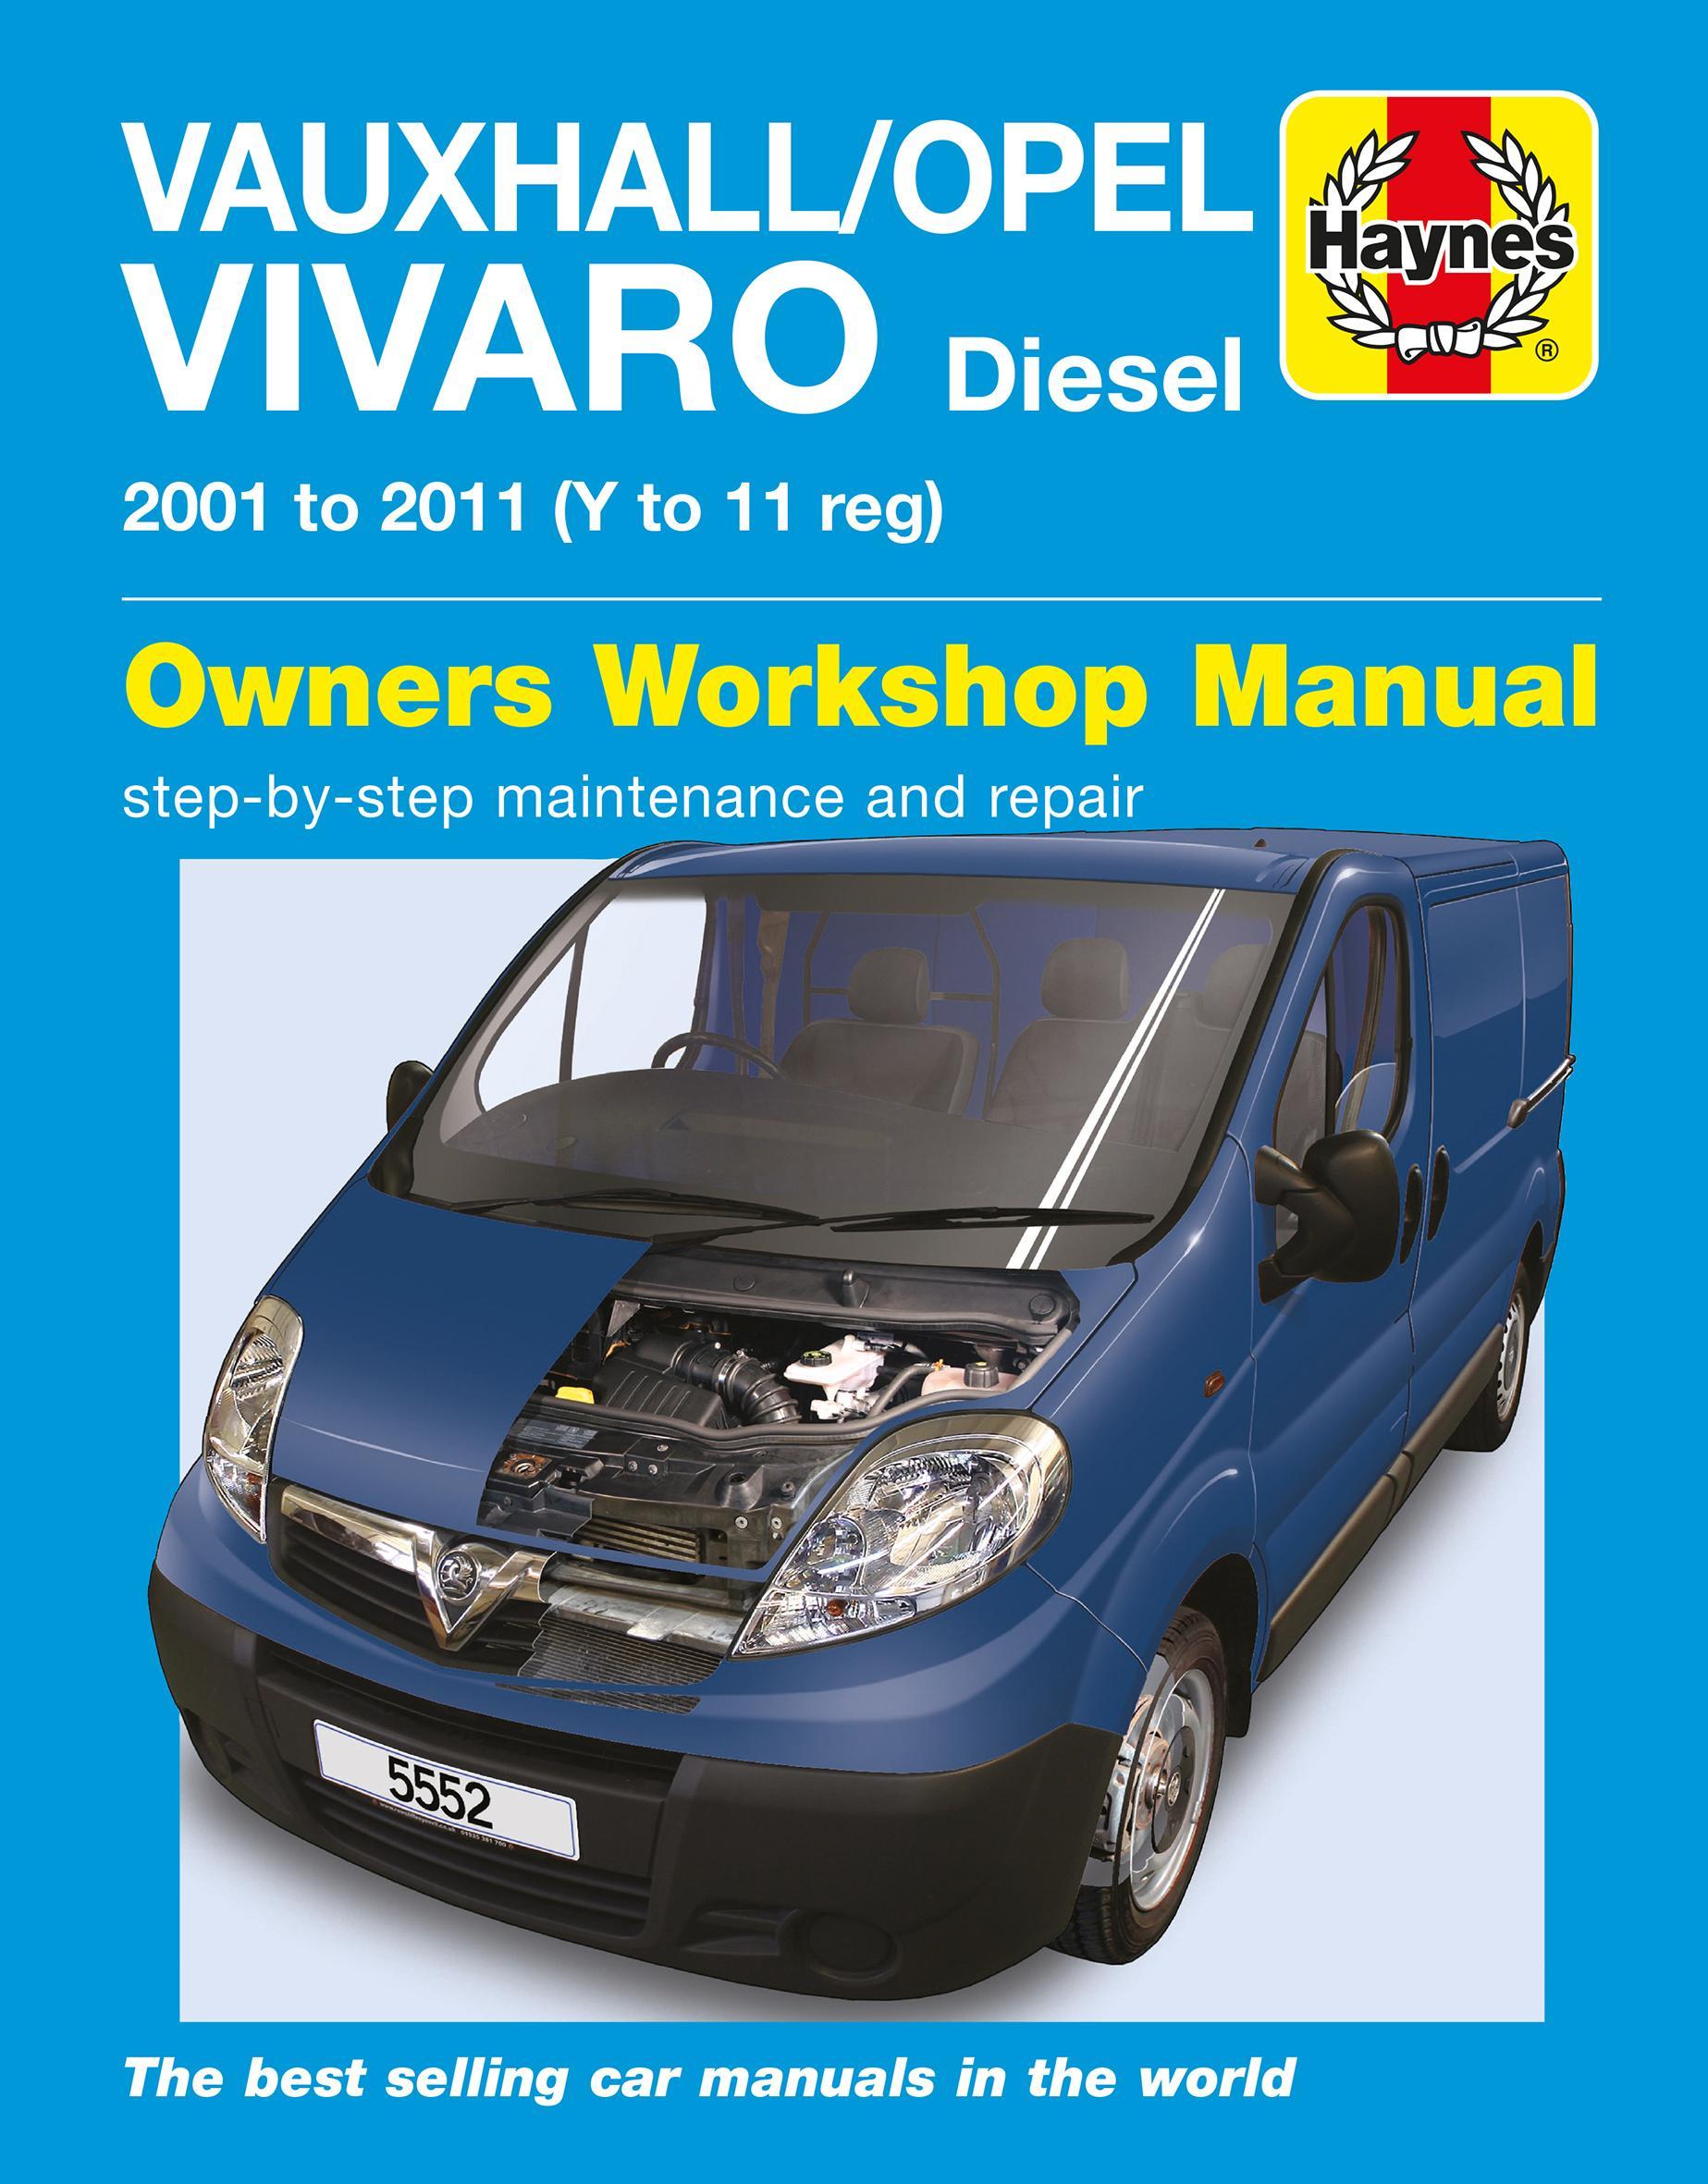 opel vivaro owners manual open source user manual u2022 rh dramatic varieties com opel vivaro repair manual opel vivaro 1.9 service manual